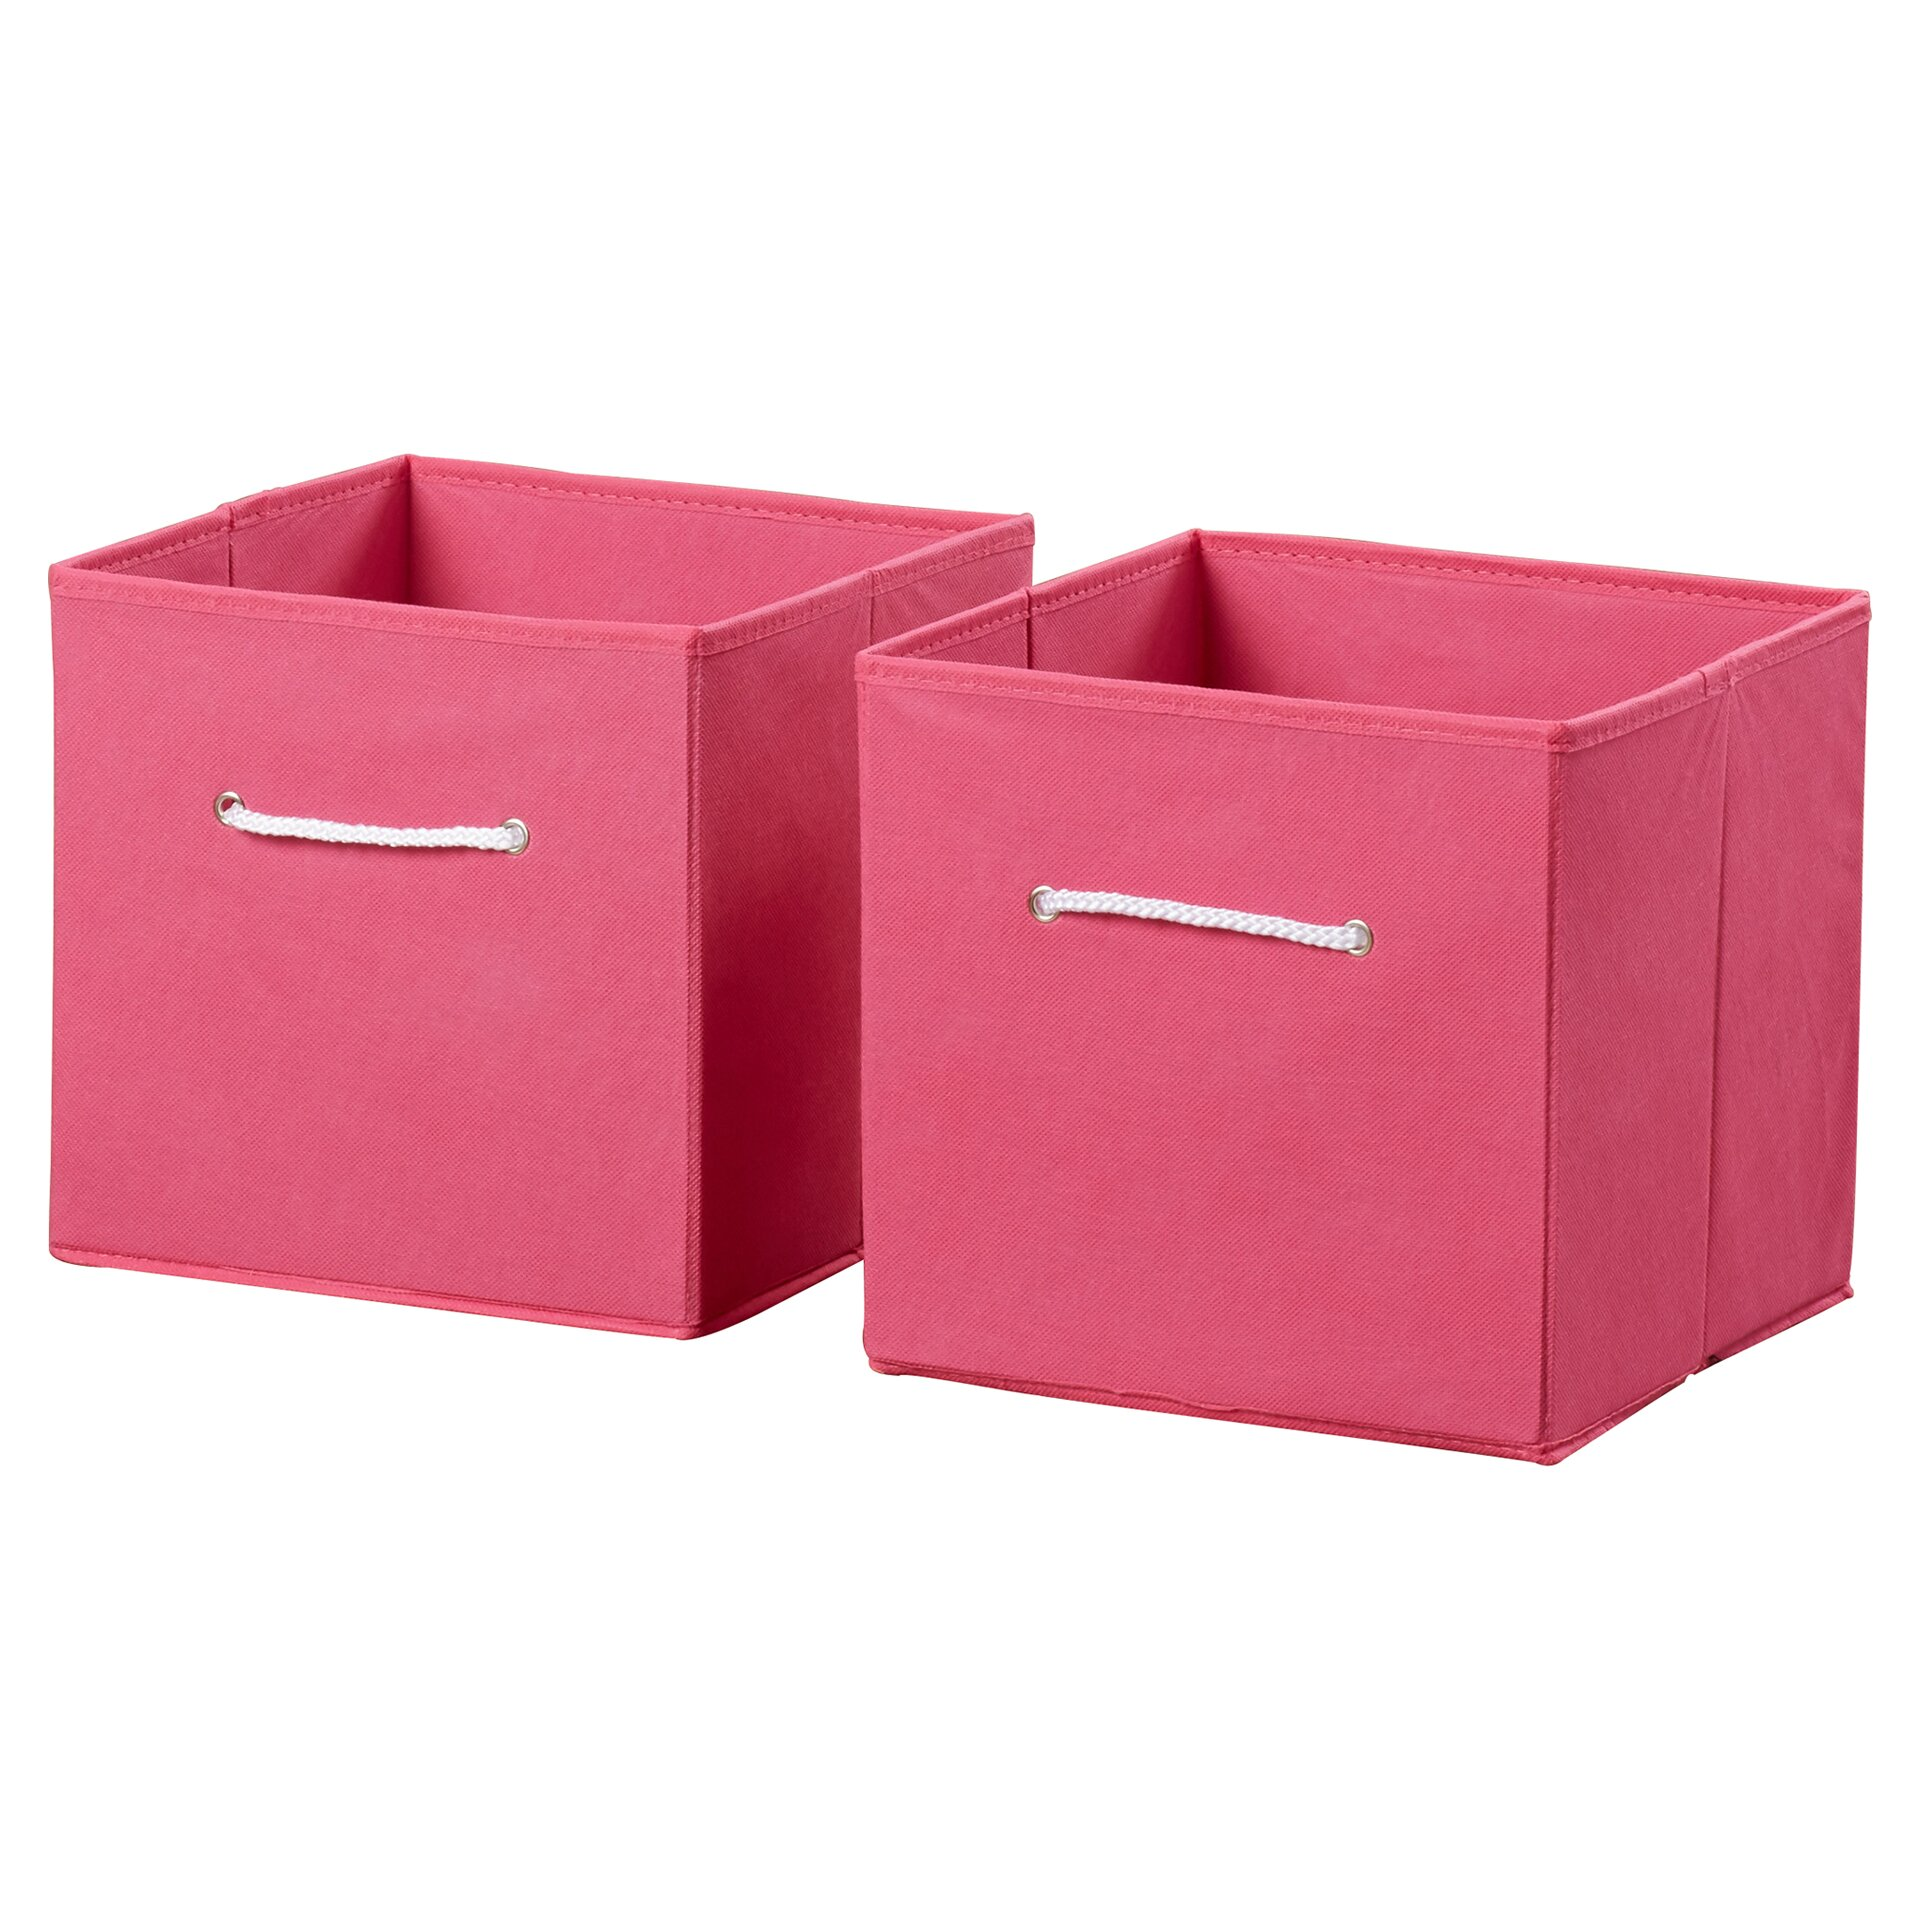 riverridge kids folding toy storage bins reviews wayfair. Black Bedroom Furniture Sets. Home Design Ideas